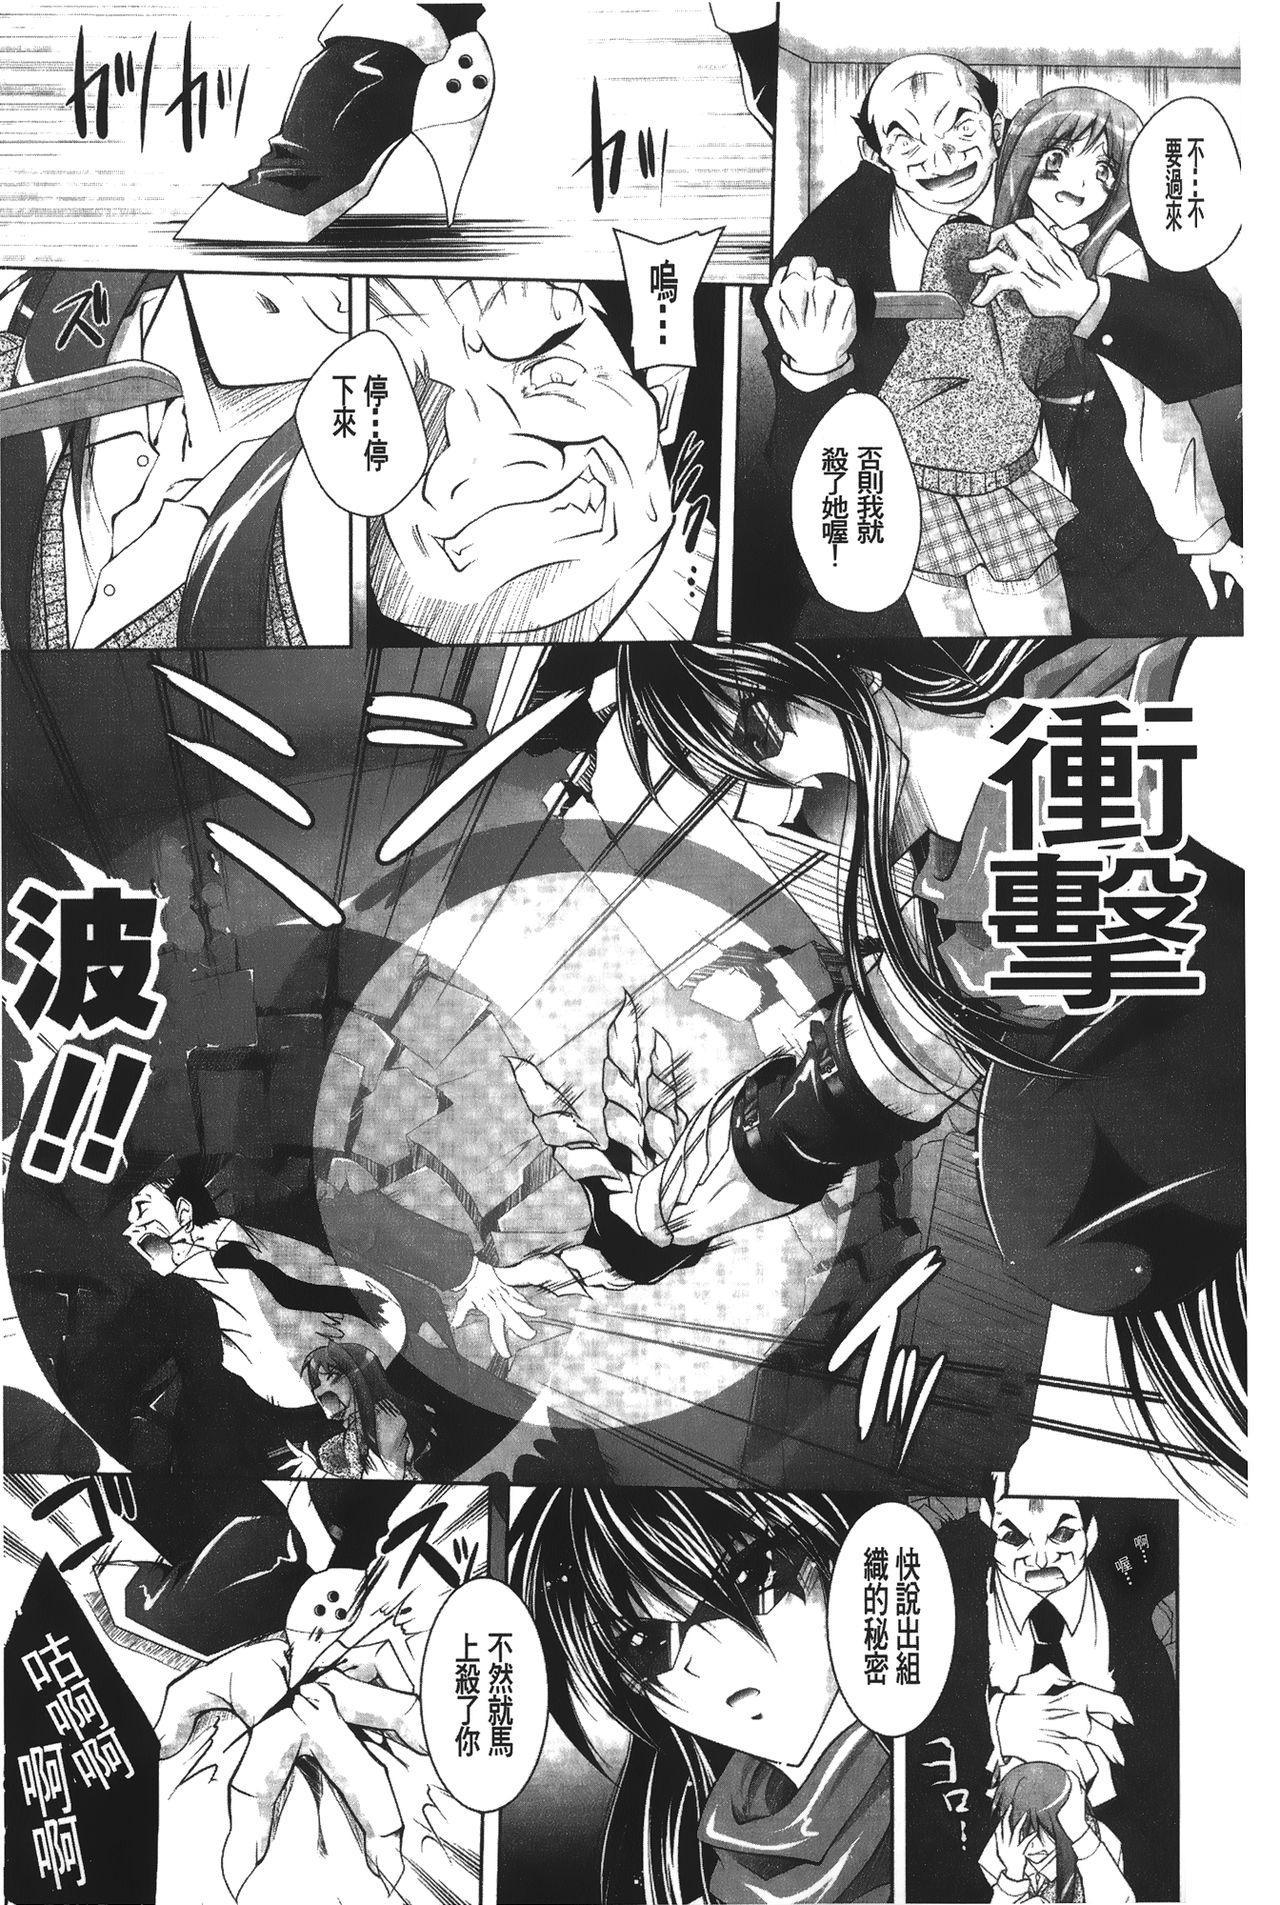 [Parfait] Datenshi-tachi no Rondo - Fallen Angels Rondo   墮天使們的圓舞曲 [Chinese] 131